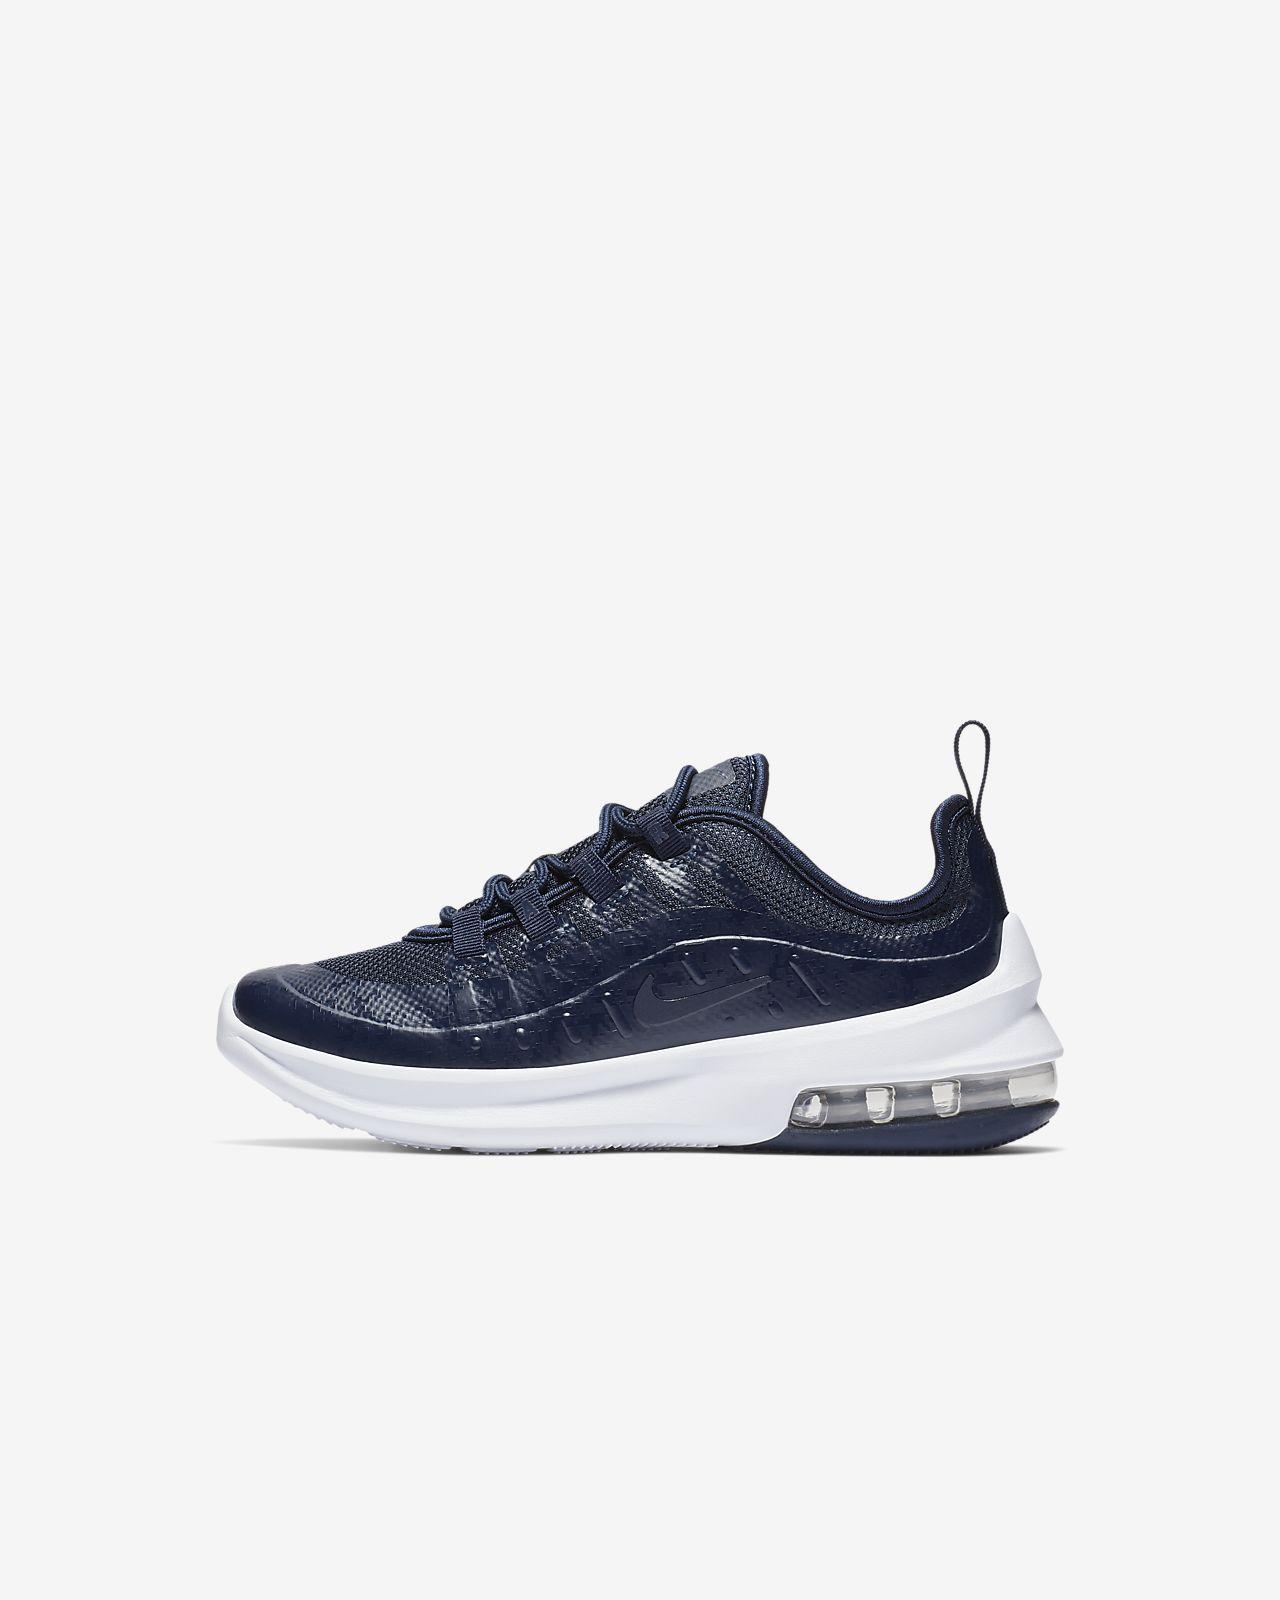 Nike Air Max Axis (PS) 幼童运动童鞋